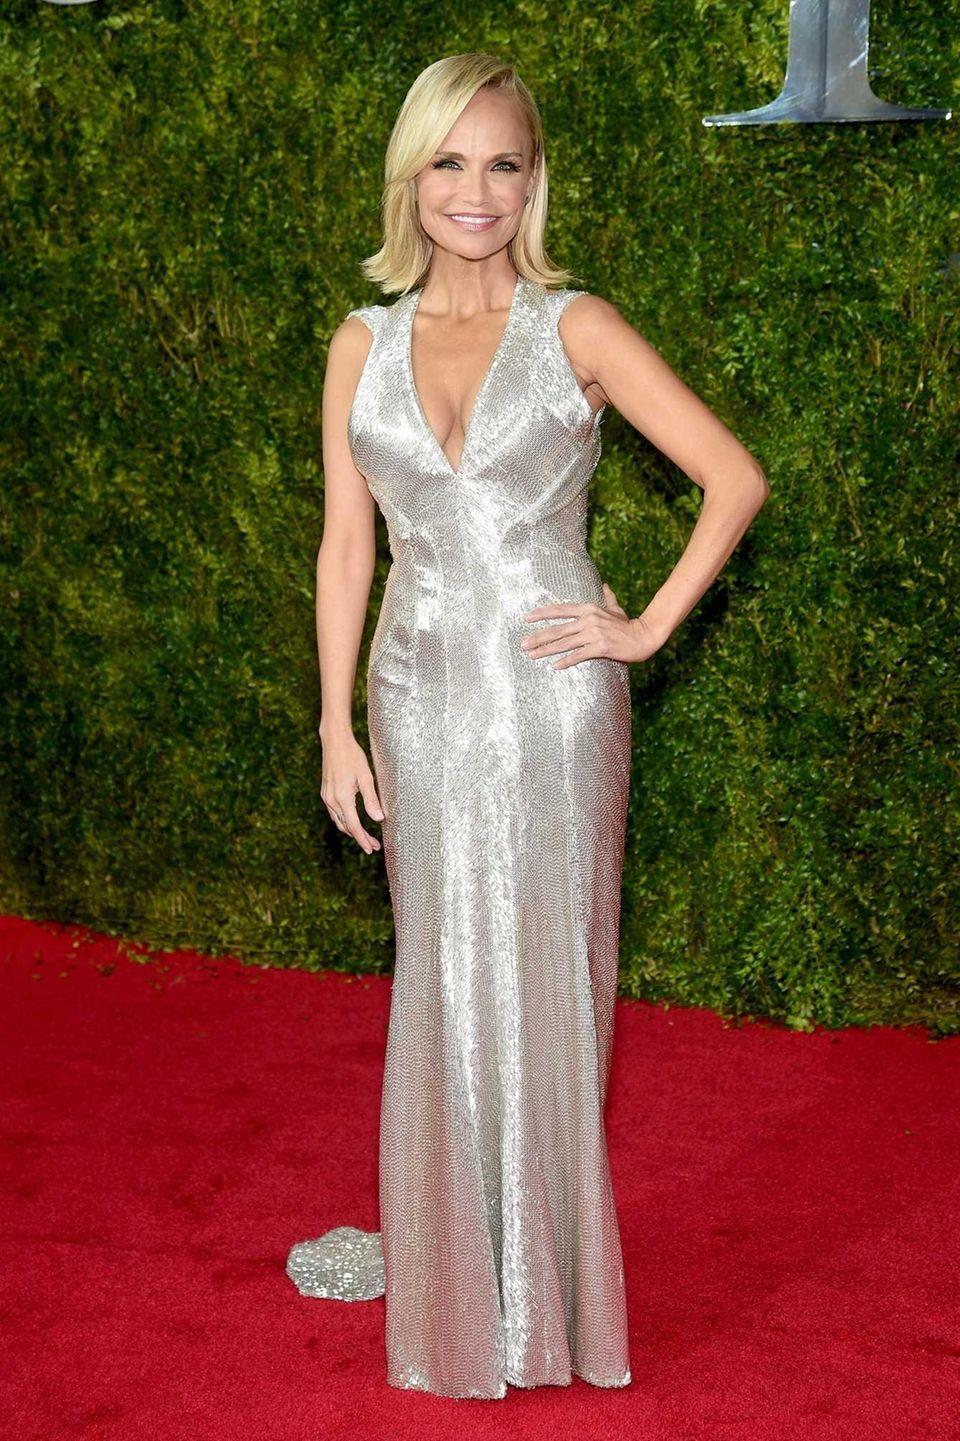 Kristin Chenoweth attends the 2015 Tony Awards at